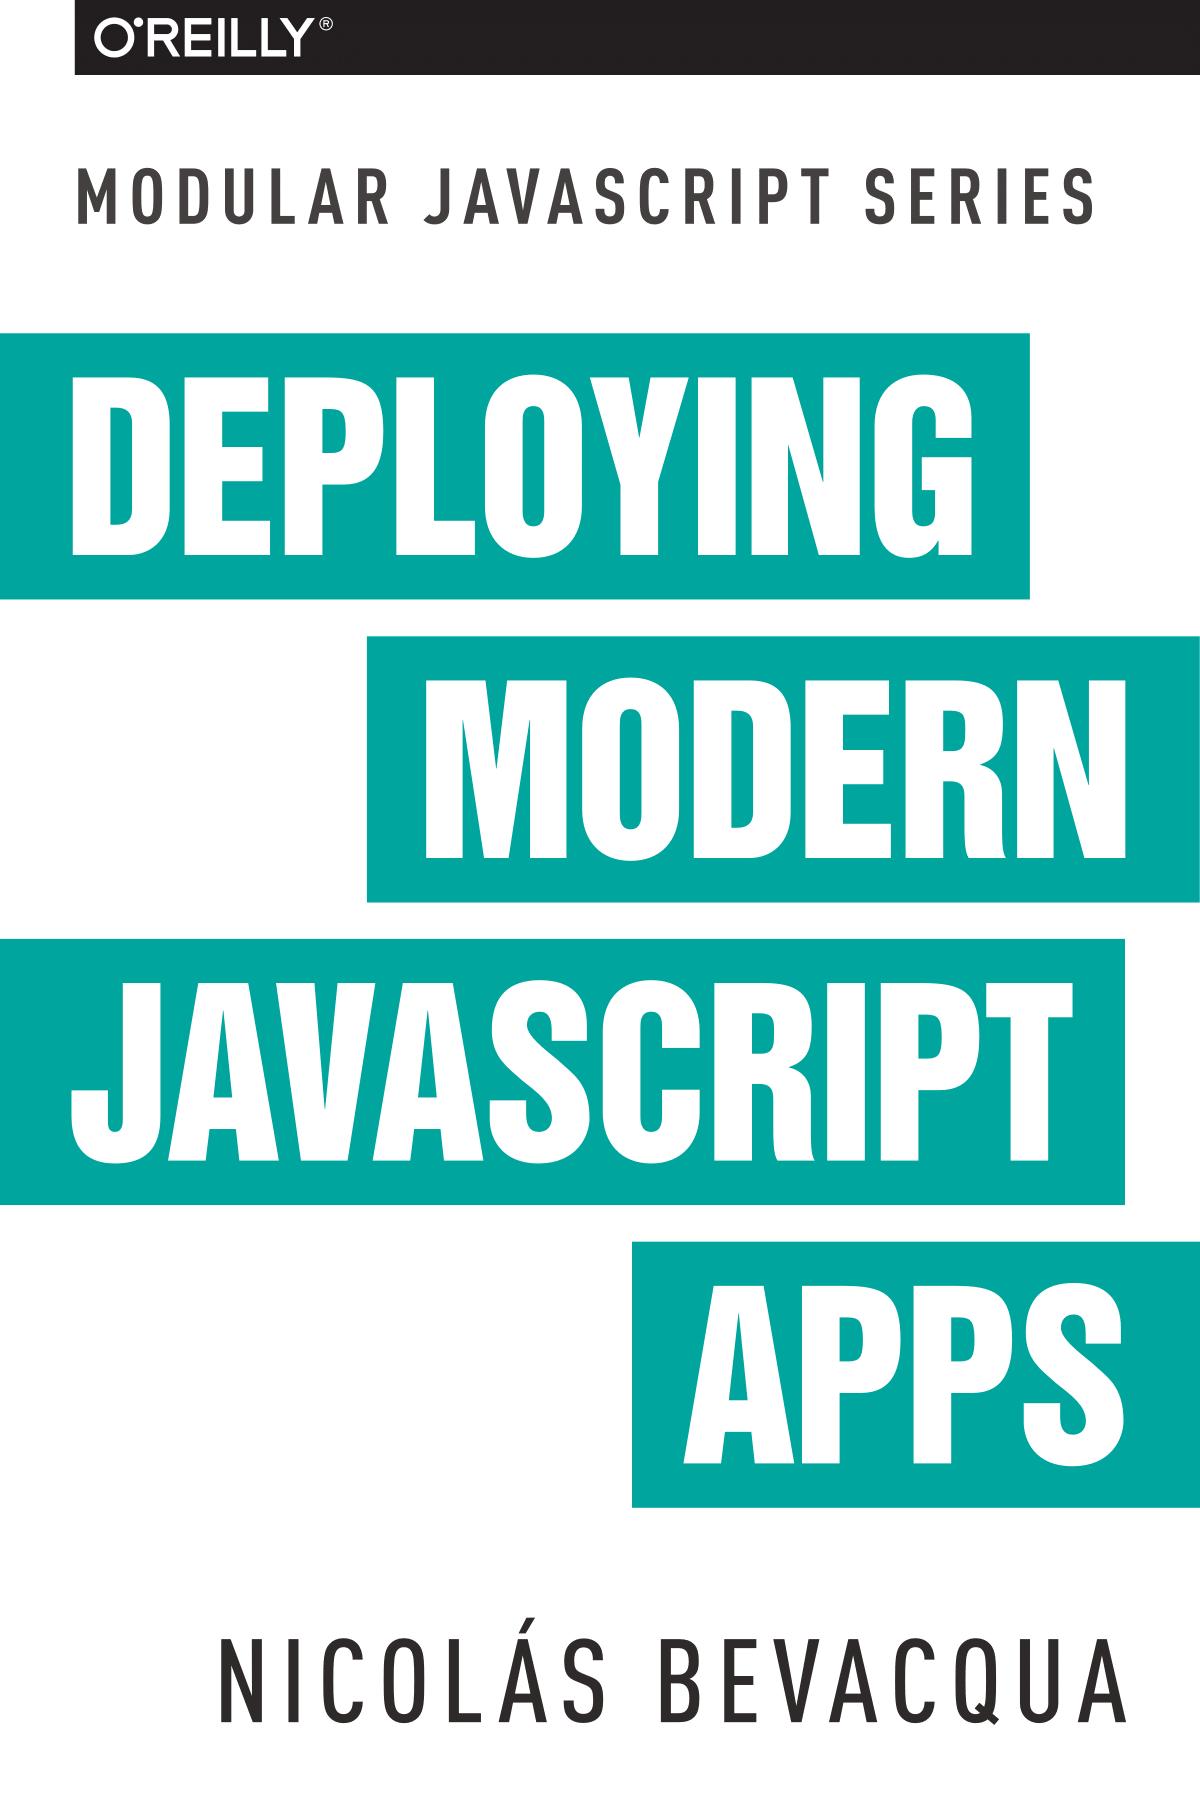 Modular Javascript Book Series